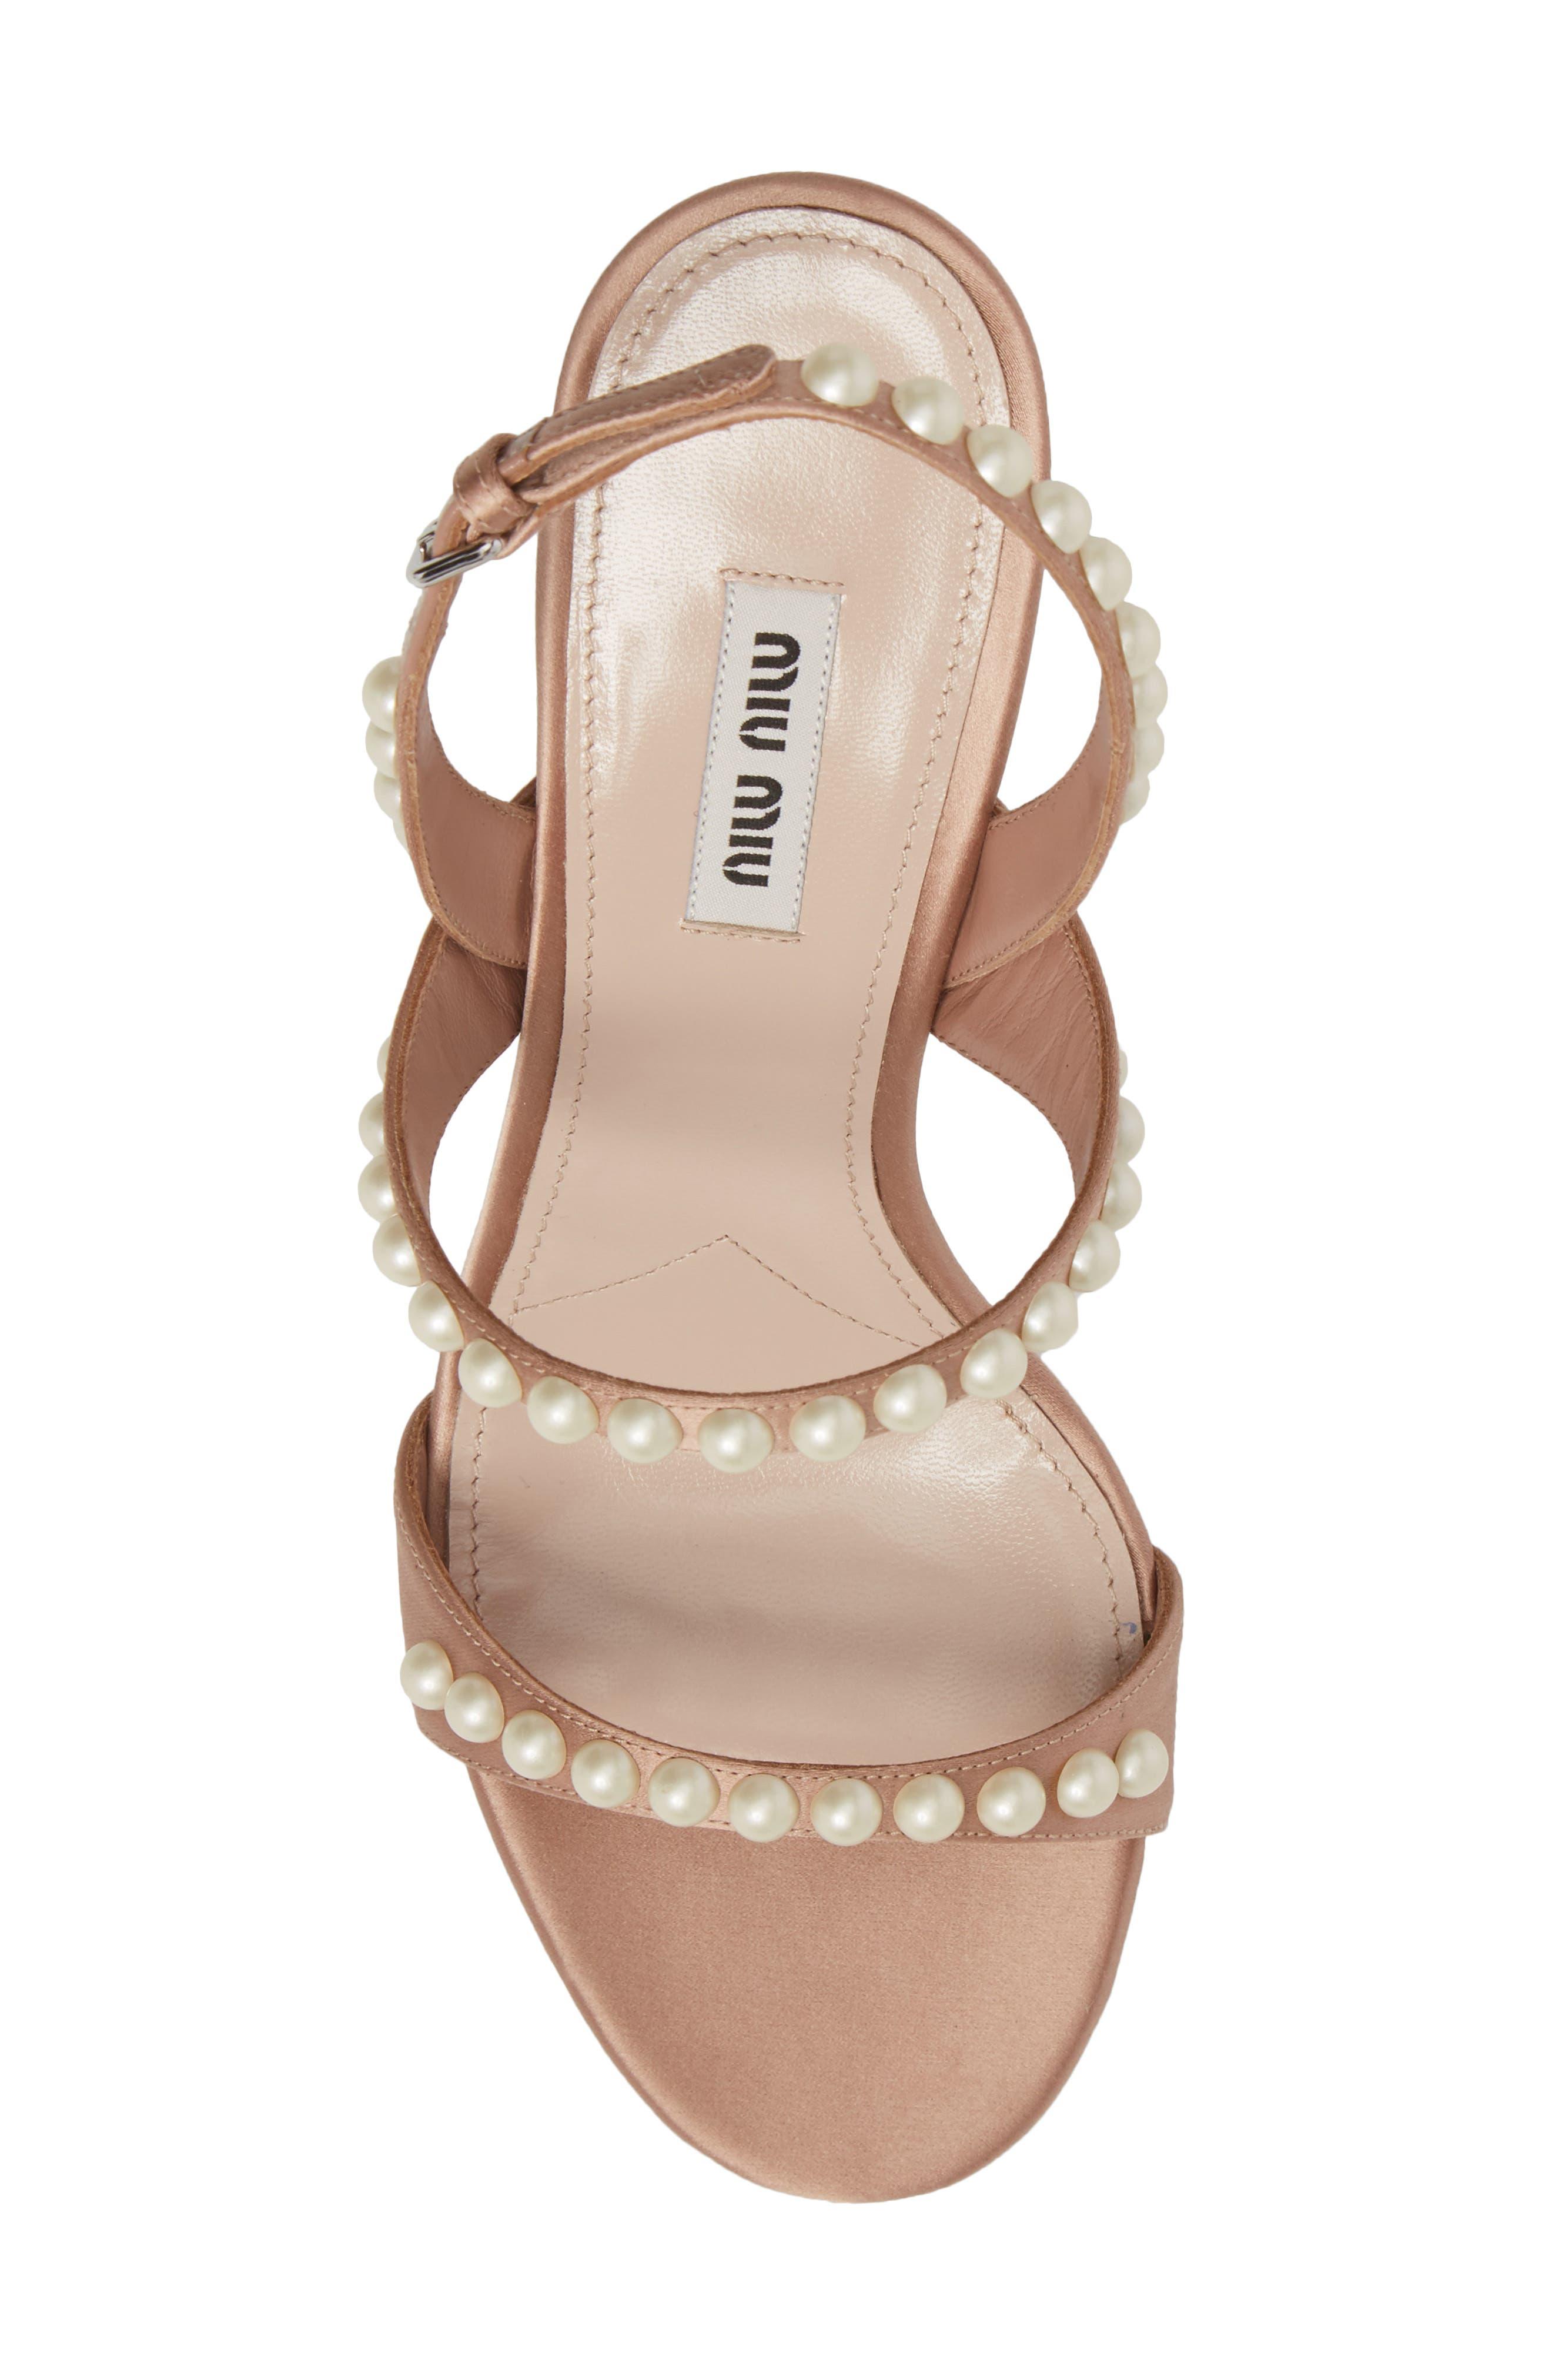 Imitation Pearl Slingback Sandal,                             Alternate thumbnail 5, color,                             Nude